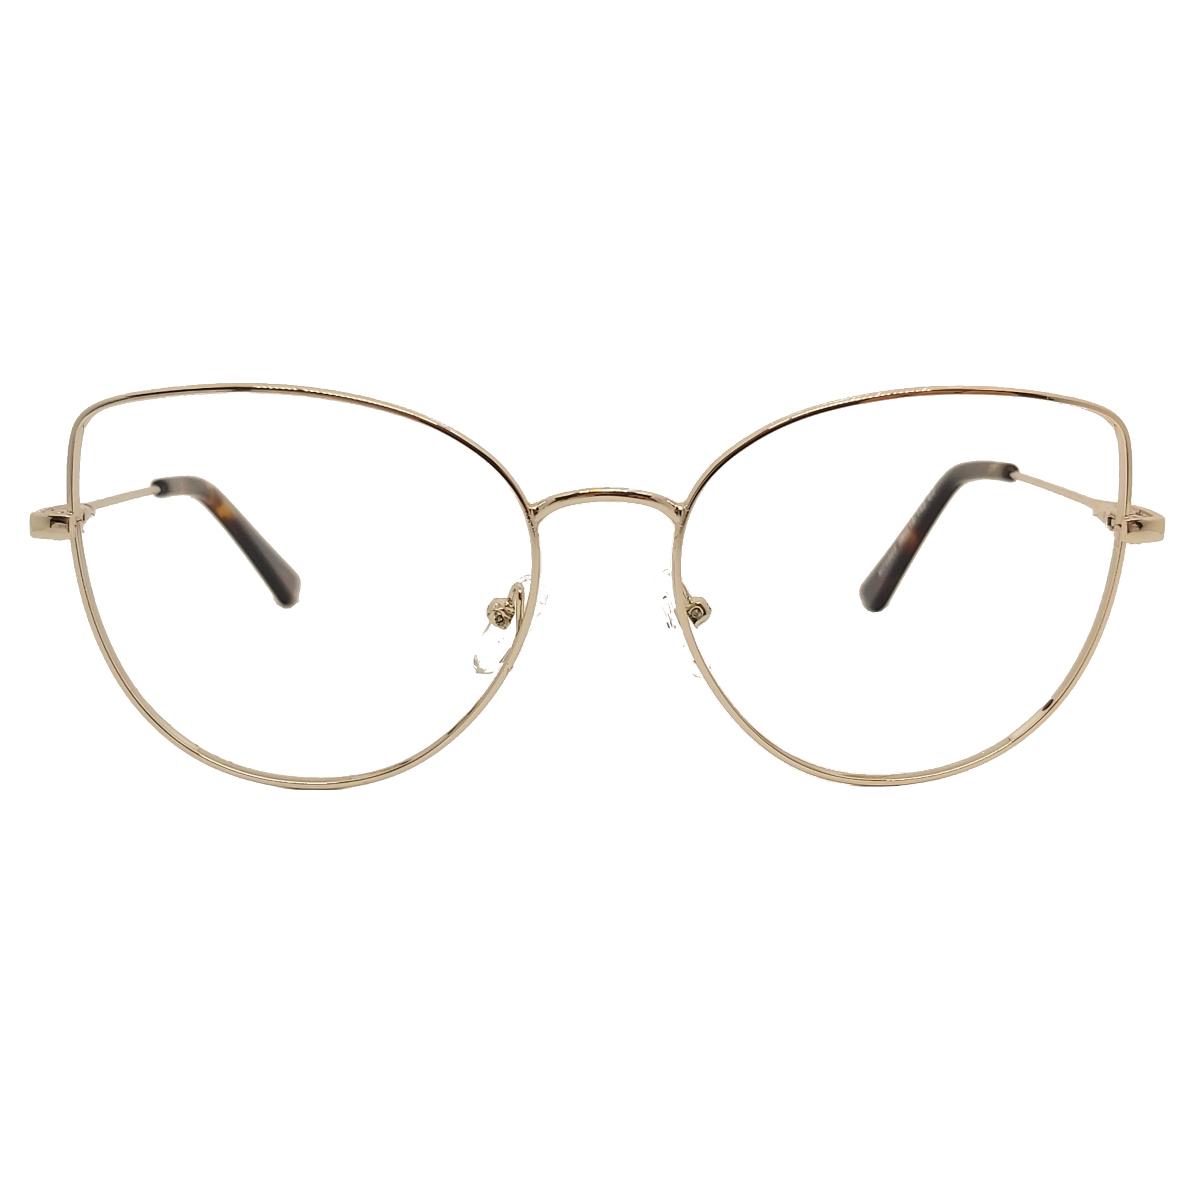 Armação oculos feminino metal cat eye